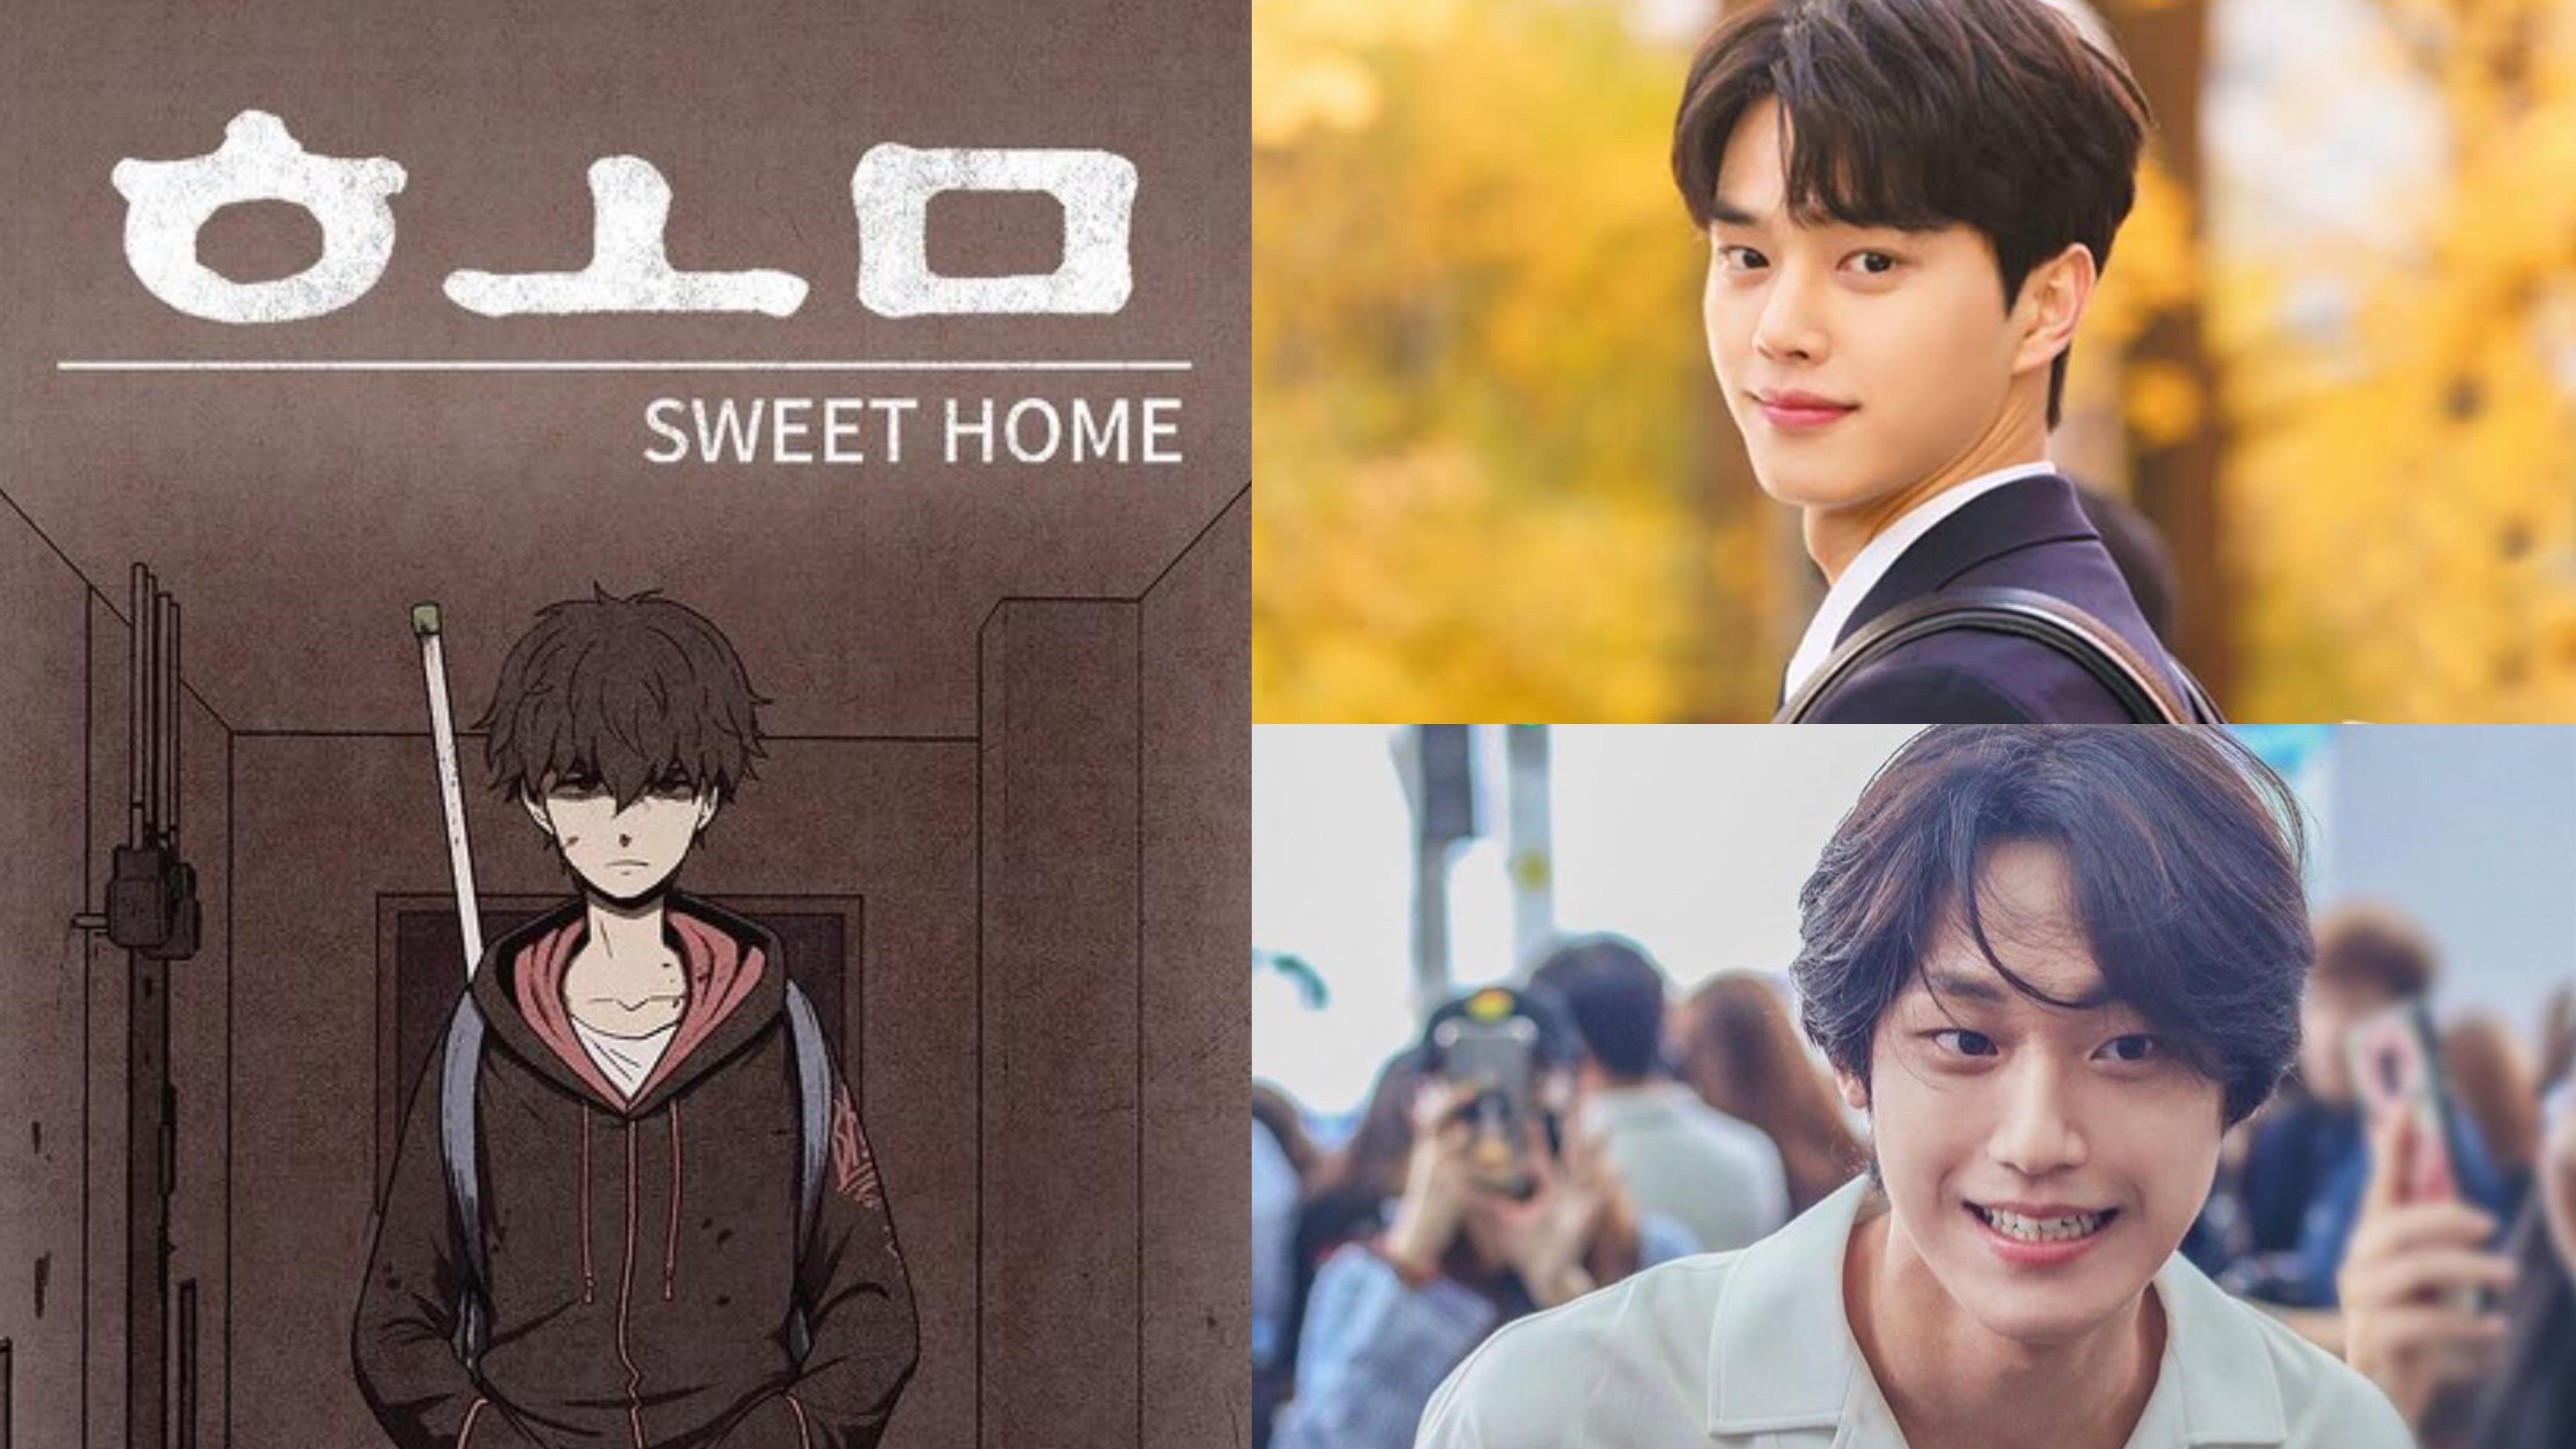 Kim kan bi (webtoon) … Icymi Song Kang And Lee Do Hyun Confirmed To Star In Netflix Adaptation Of Thriller Webtoon Sweet Home Annyeong Oppa